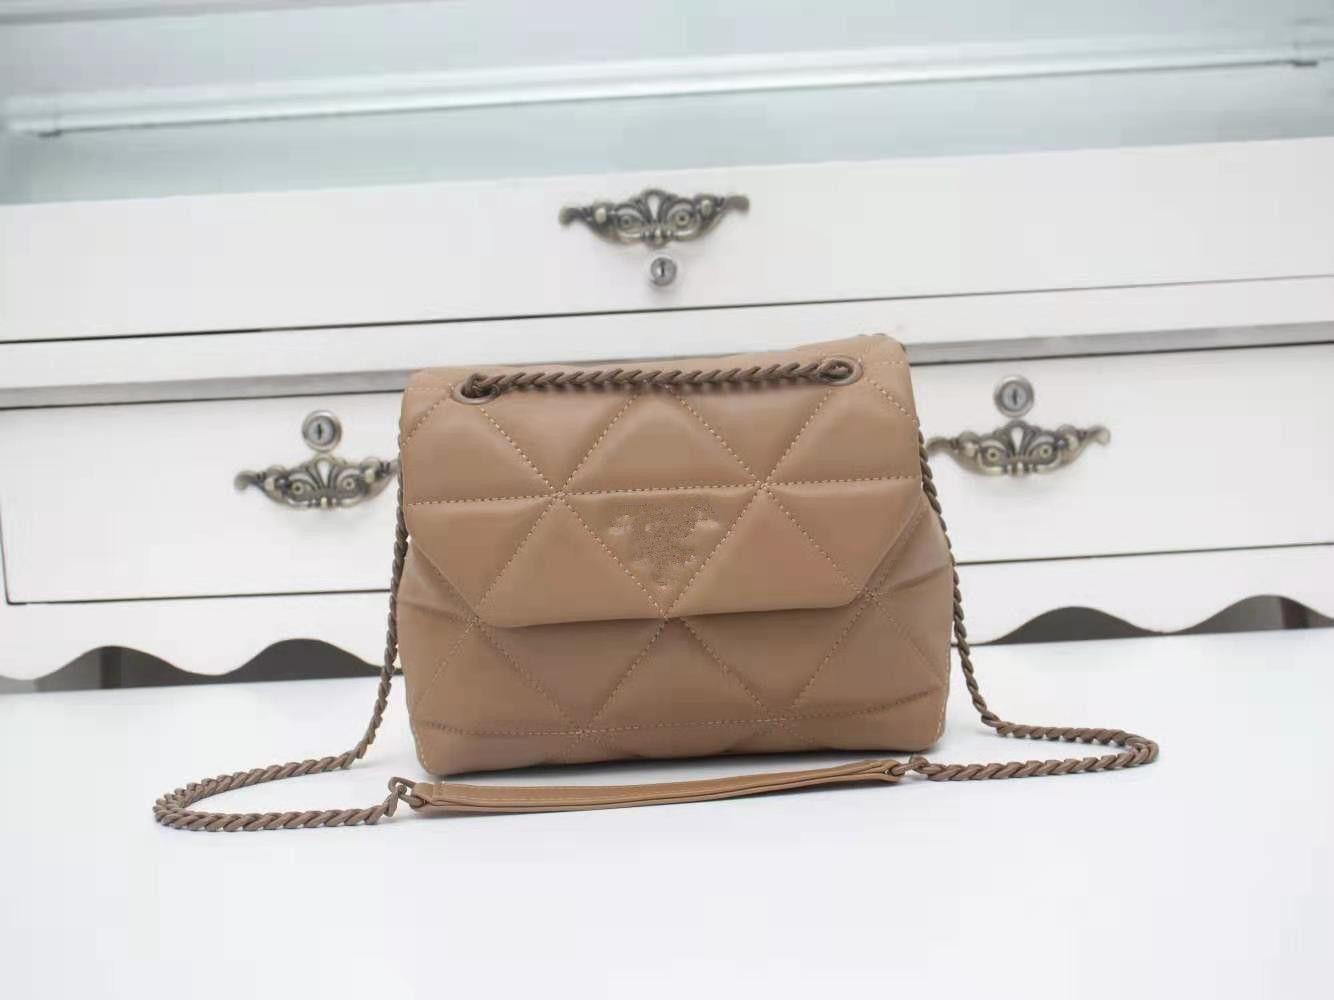 Strap Women Luxurys Bolsa de hombro Geninue Flap Cadena New Diamond Lattice Bag Bag Designers vendidos 2020 Hot Hollbag Cuero QXDBL